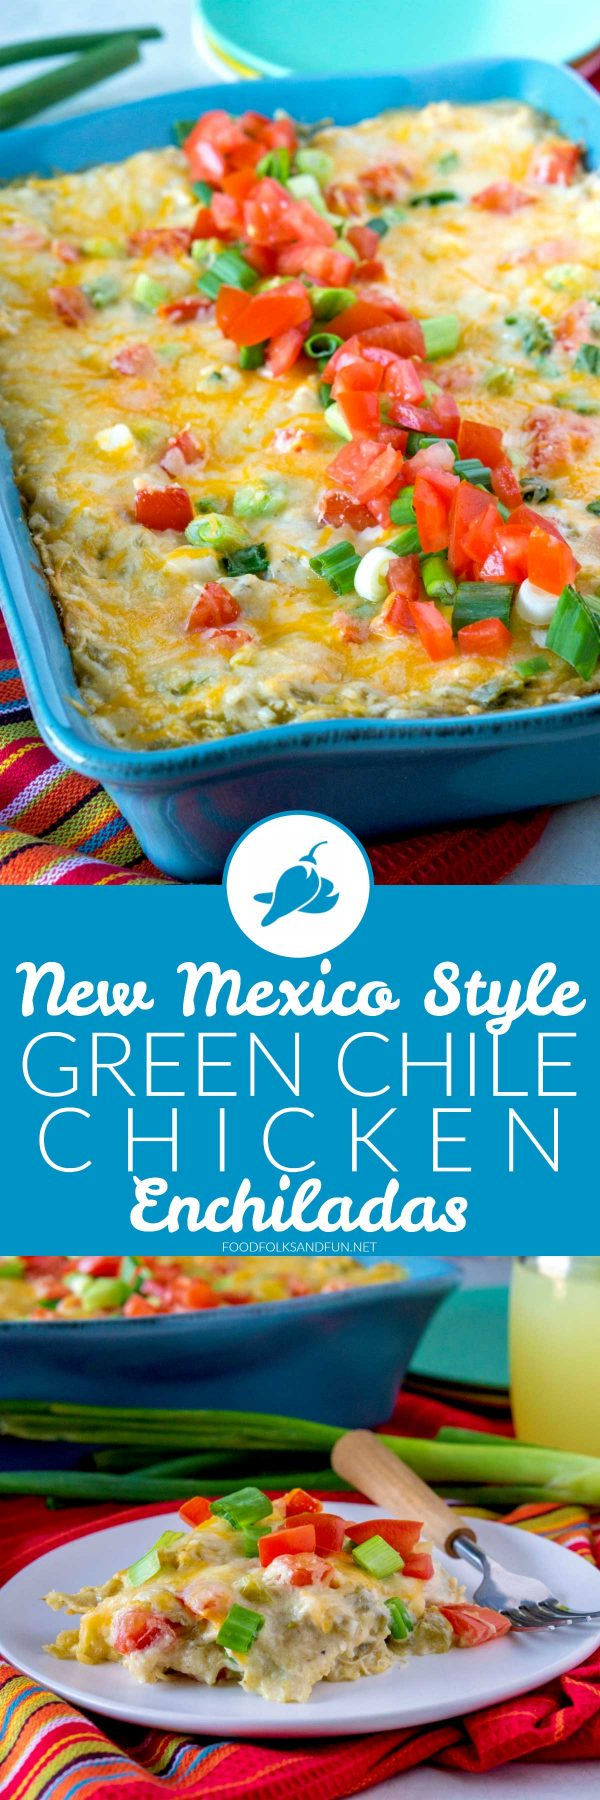 My favorite green chile enchiladas!